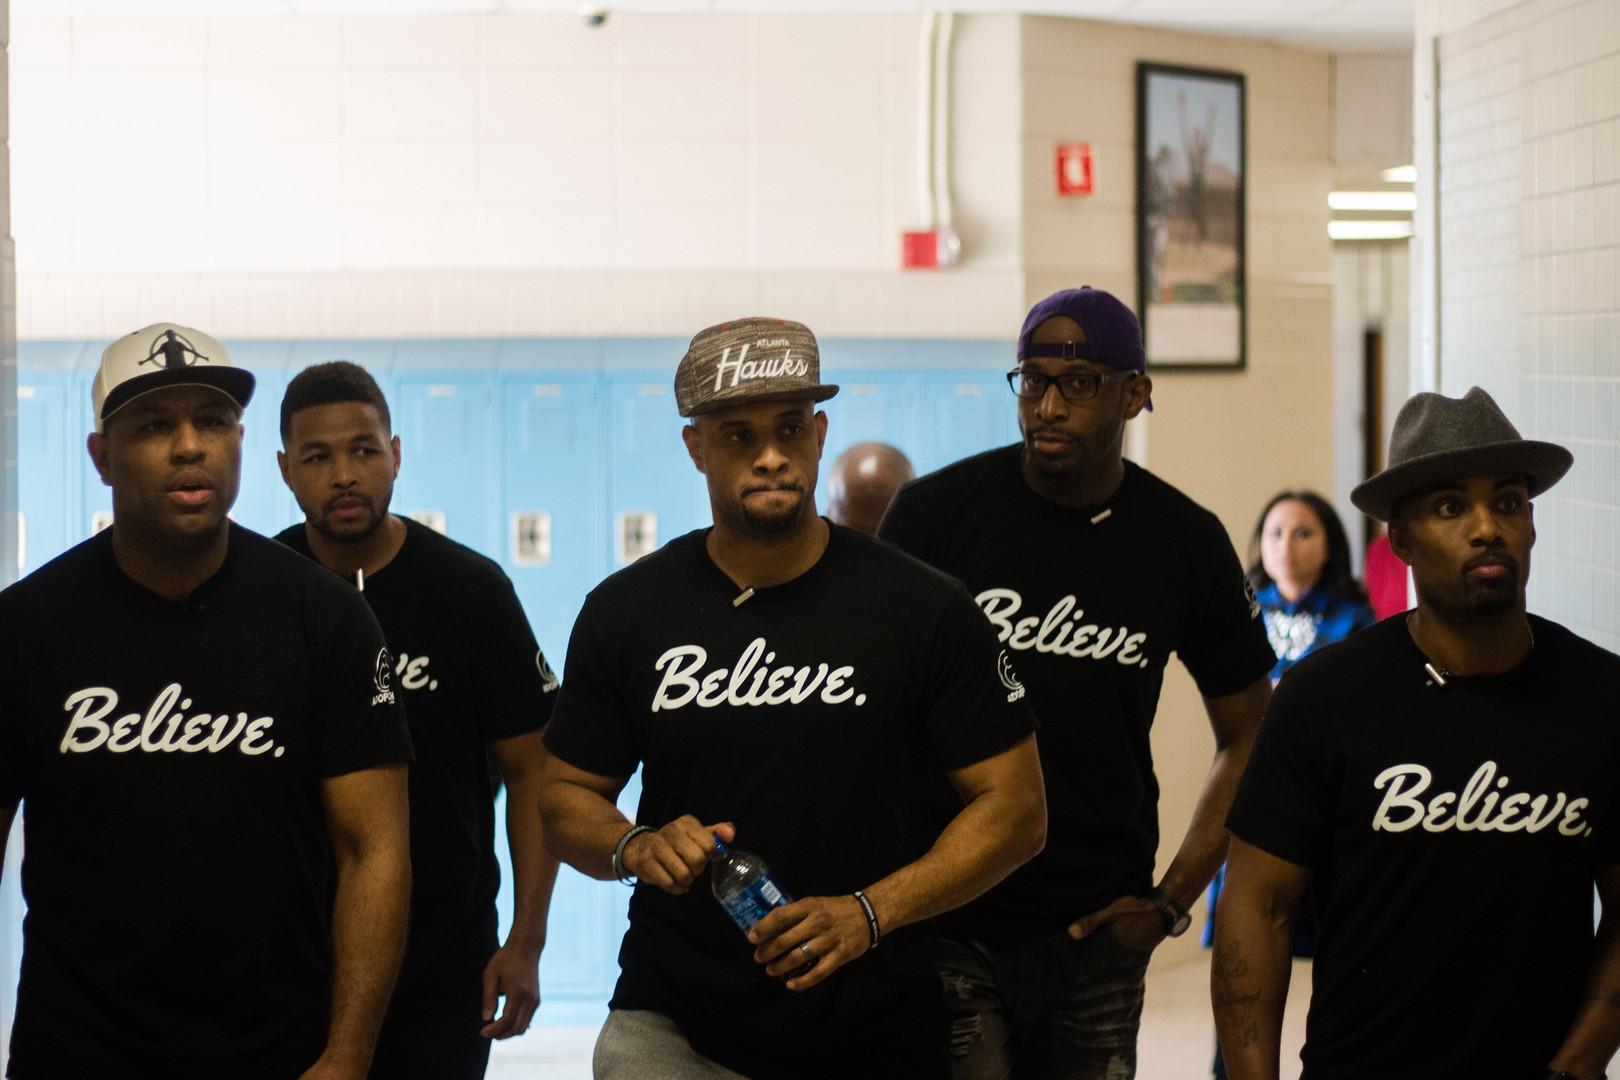 Squad in the Hallway (Eric, Inky, David,